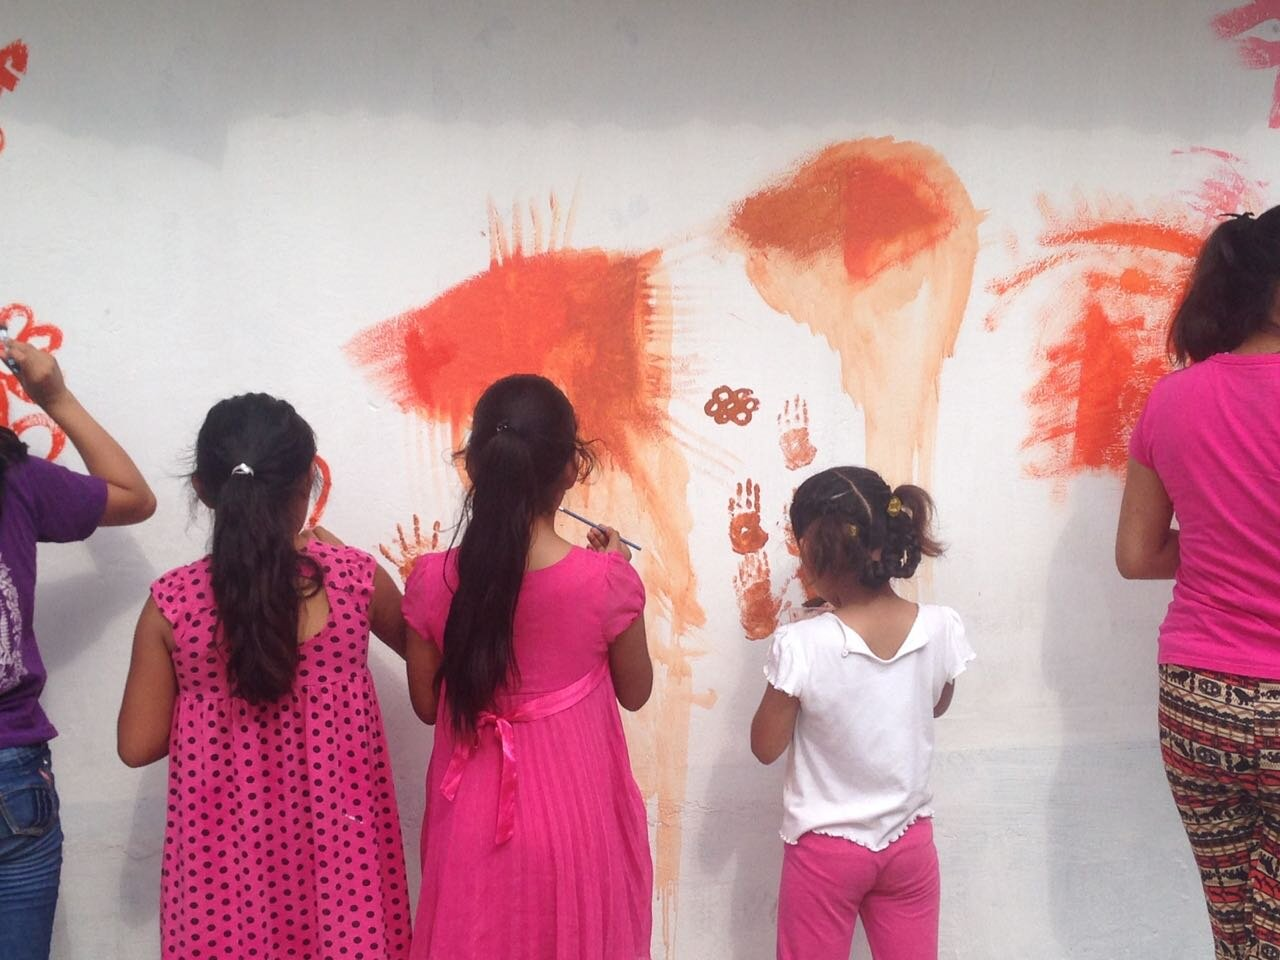 Chlitoyak locals add their voice to the murals